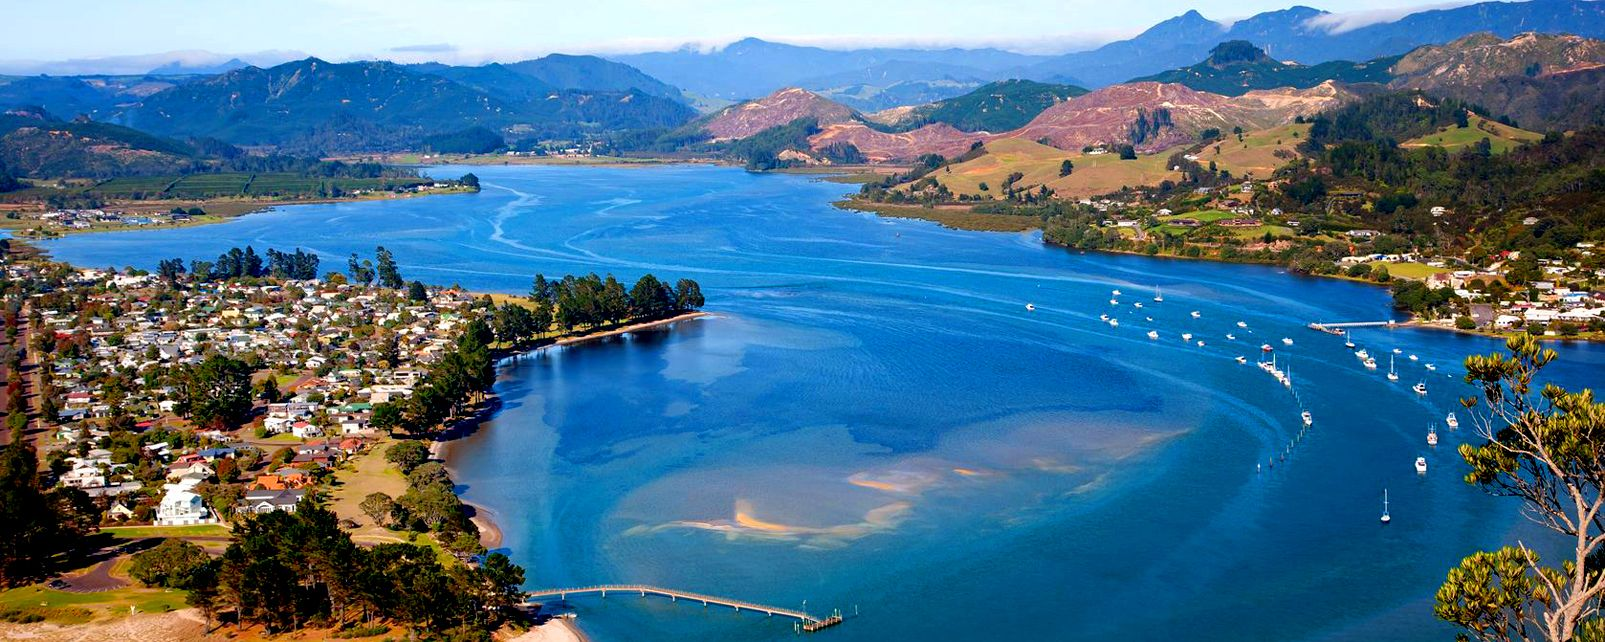 New Zealand North Island To South Island Flight